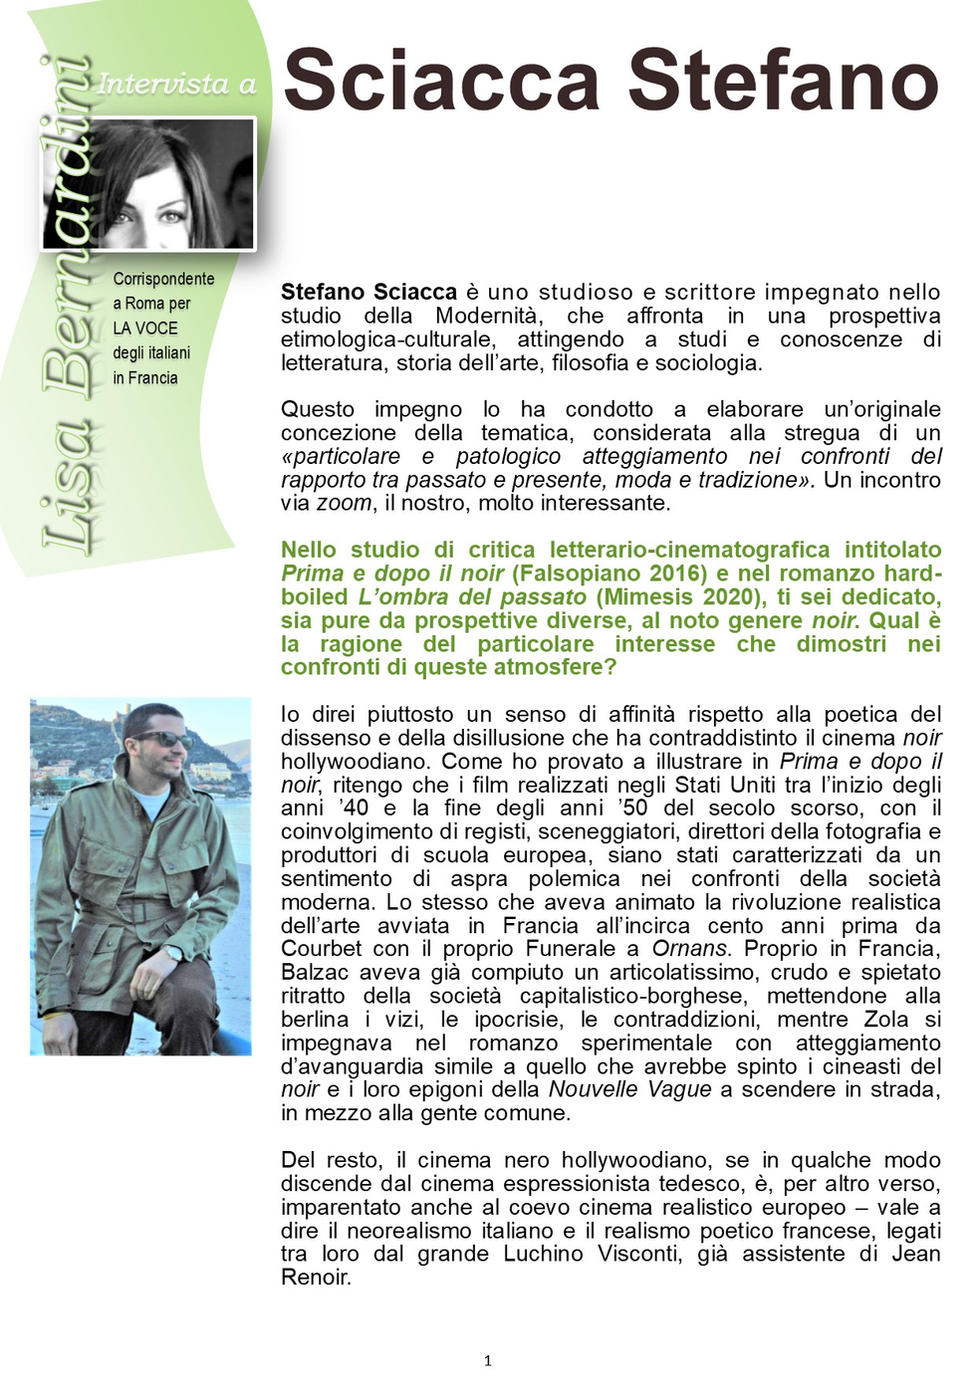 art SCIACCA 1 Stefano 14052021.jpg